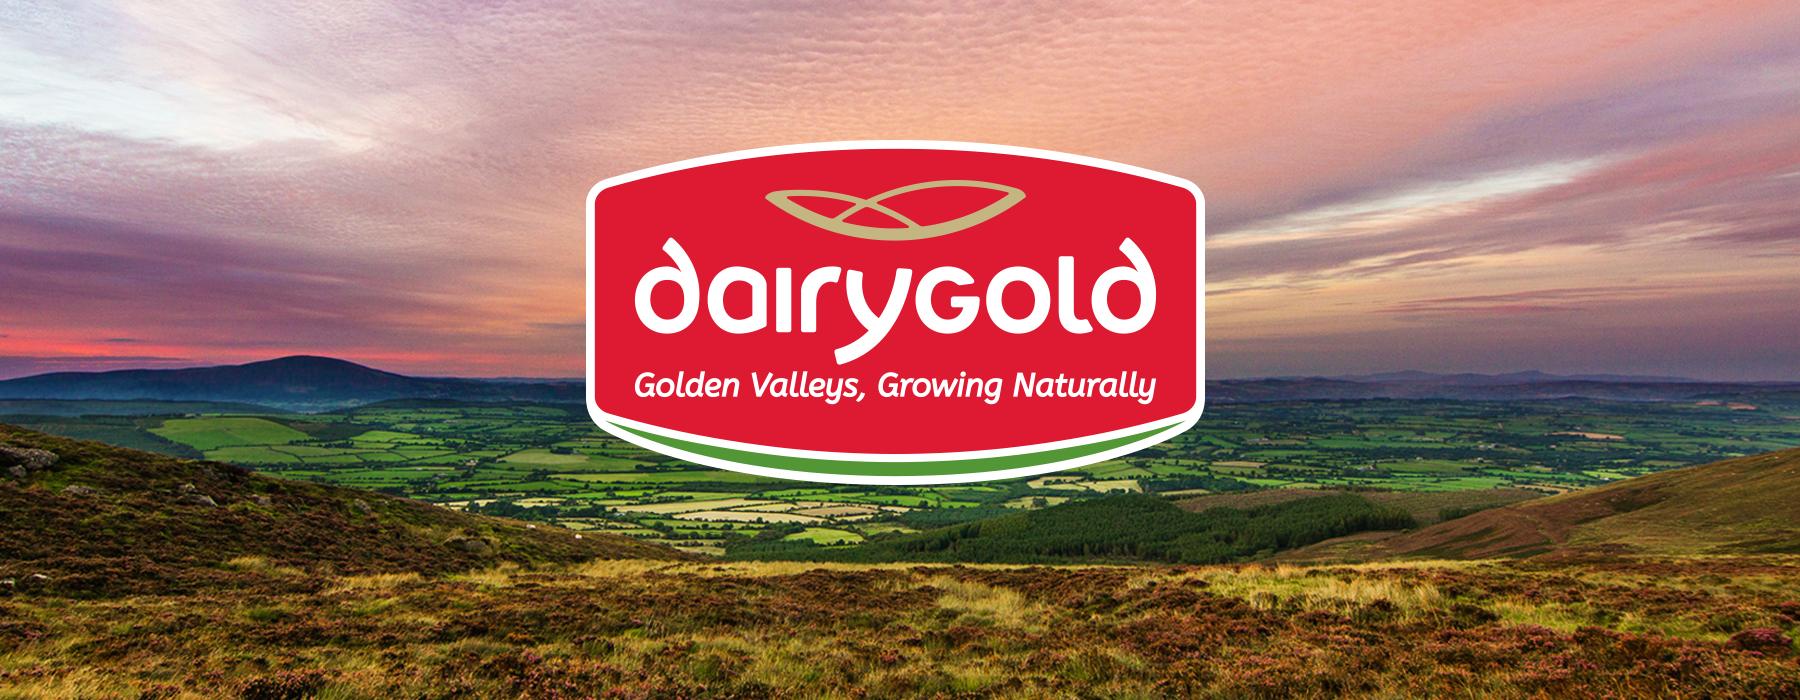 Dairygold Brand Identity